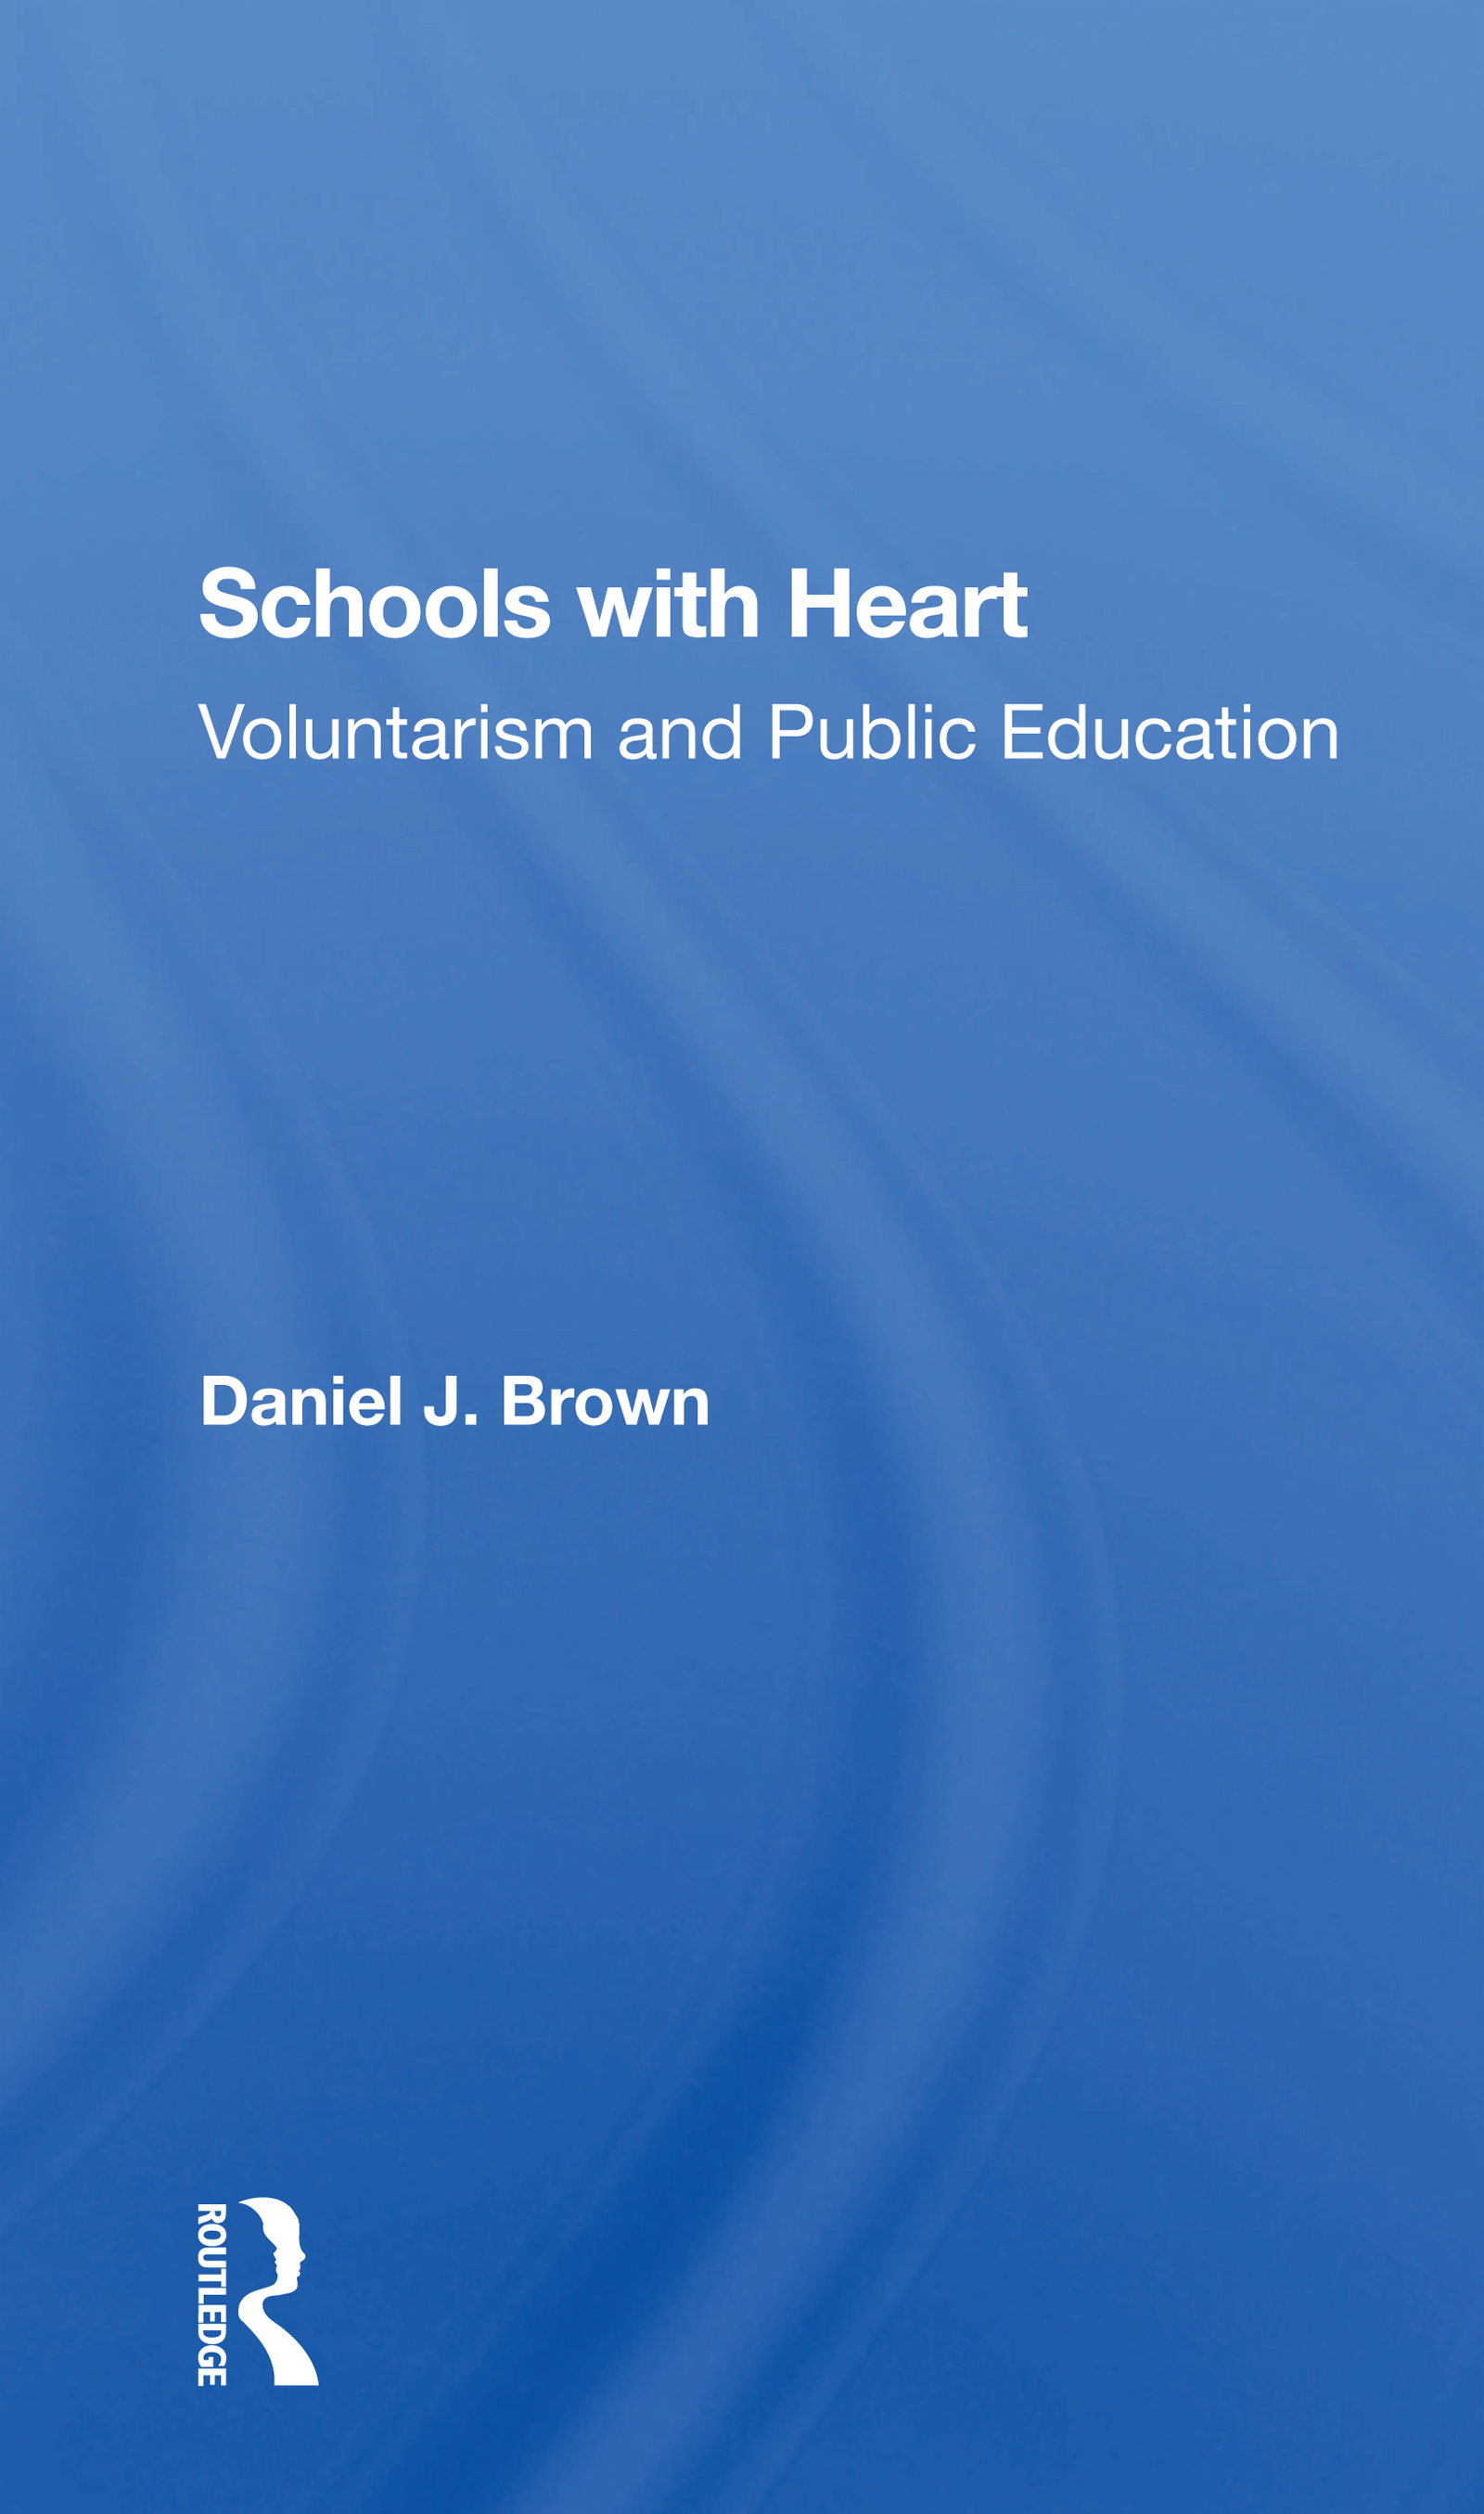 Schools with Heart